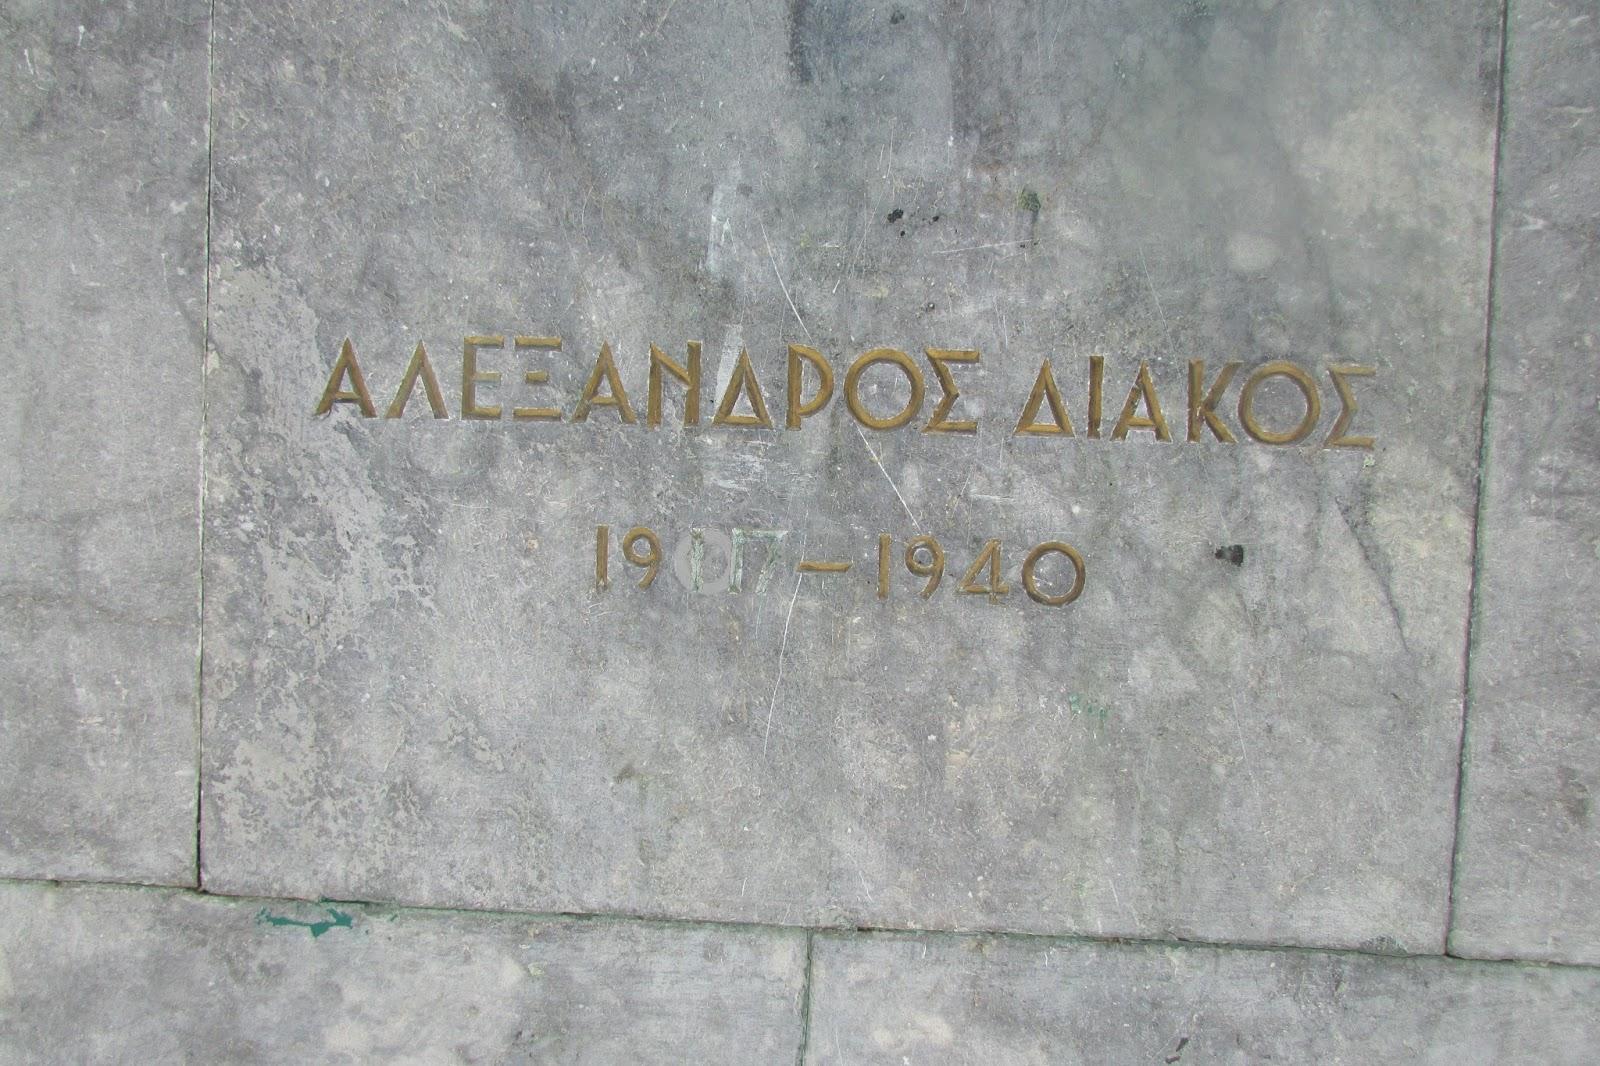 Diakos Aleksander